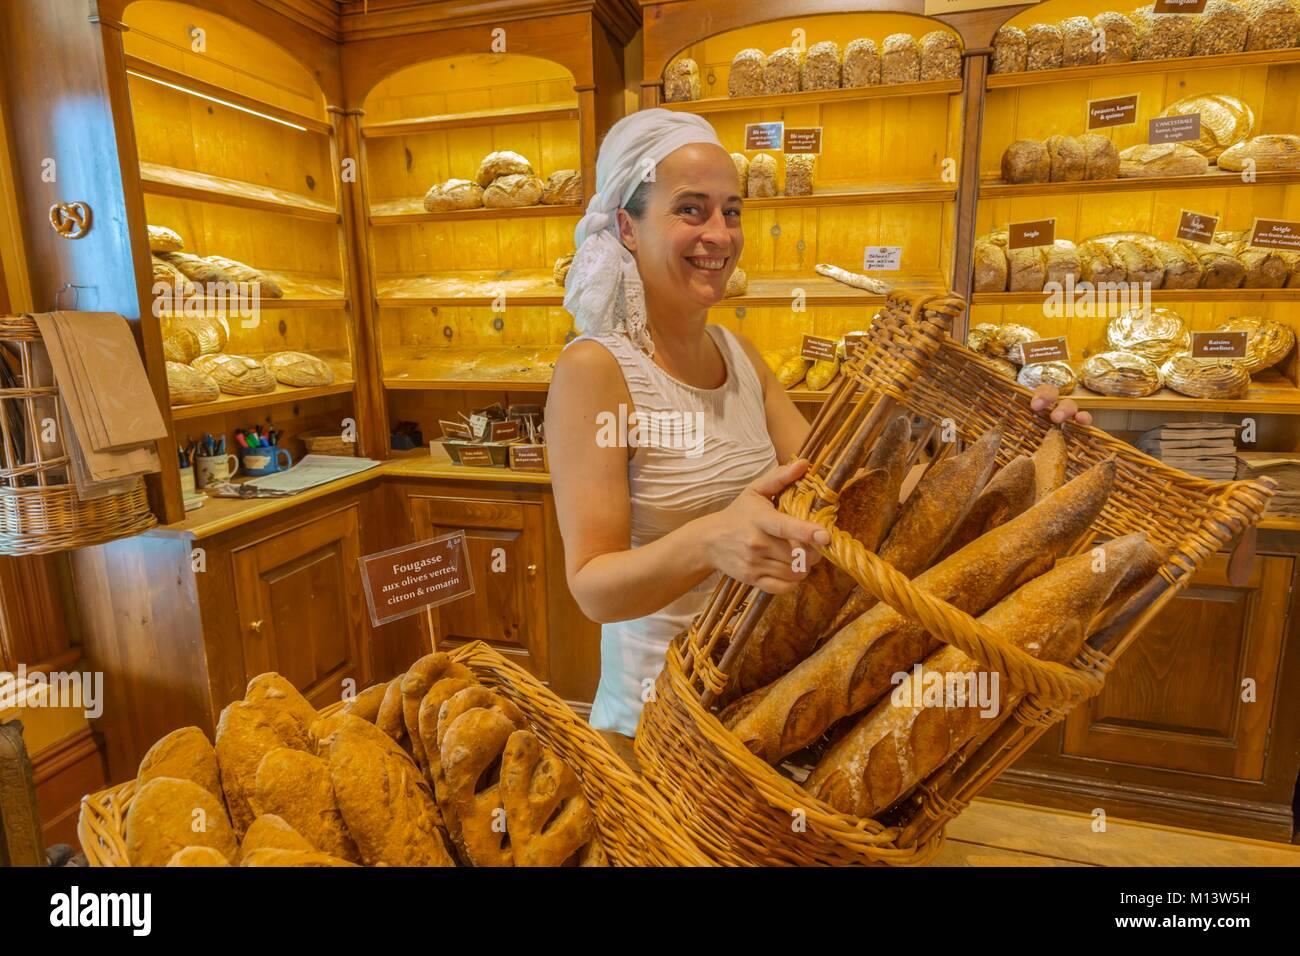 Canada, Province of Quebec, Bas-Saint-Laurent Region, Kamouraska, Niemand Bakery, one of the bakers - Stock Image